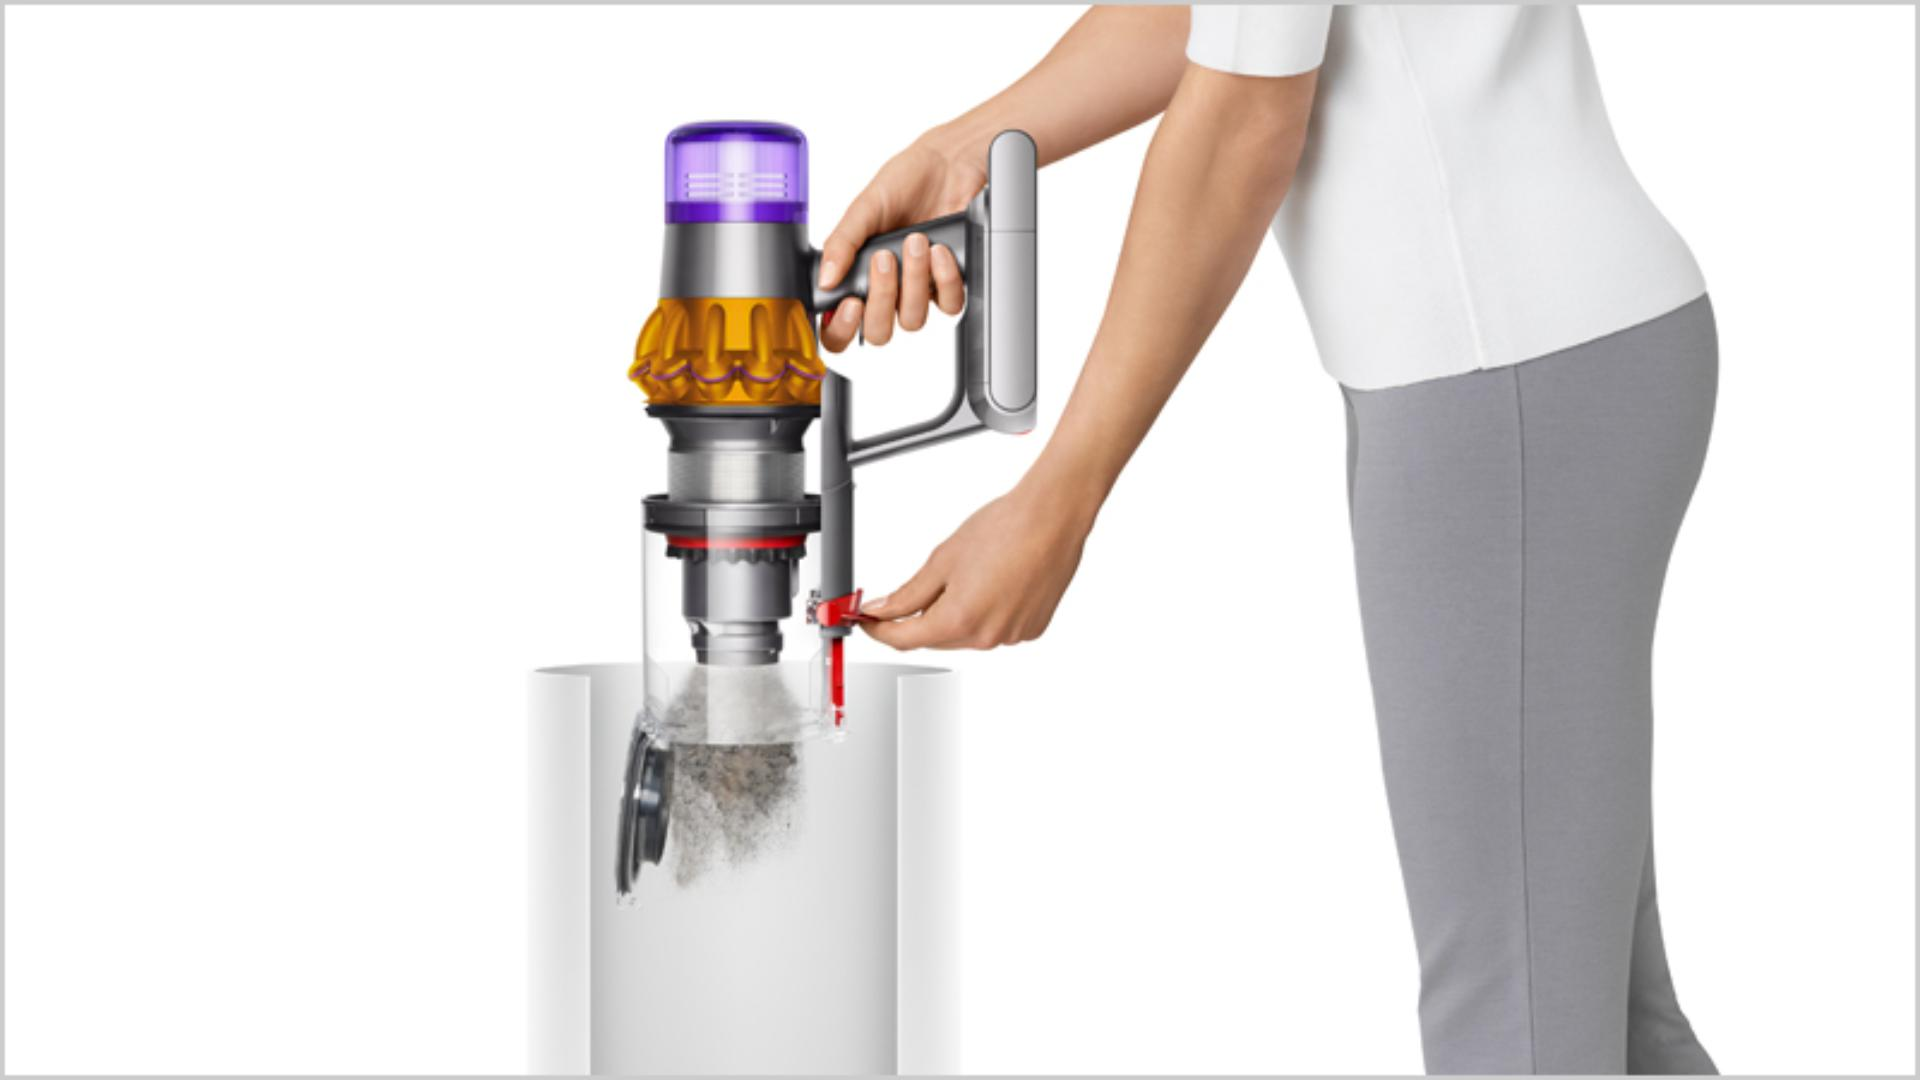 Woman emptying Dyson vacuum into the bin